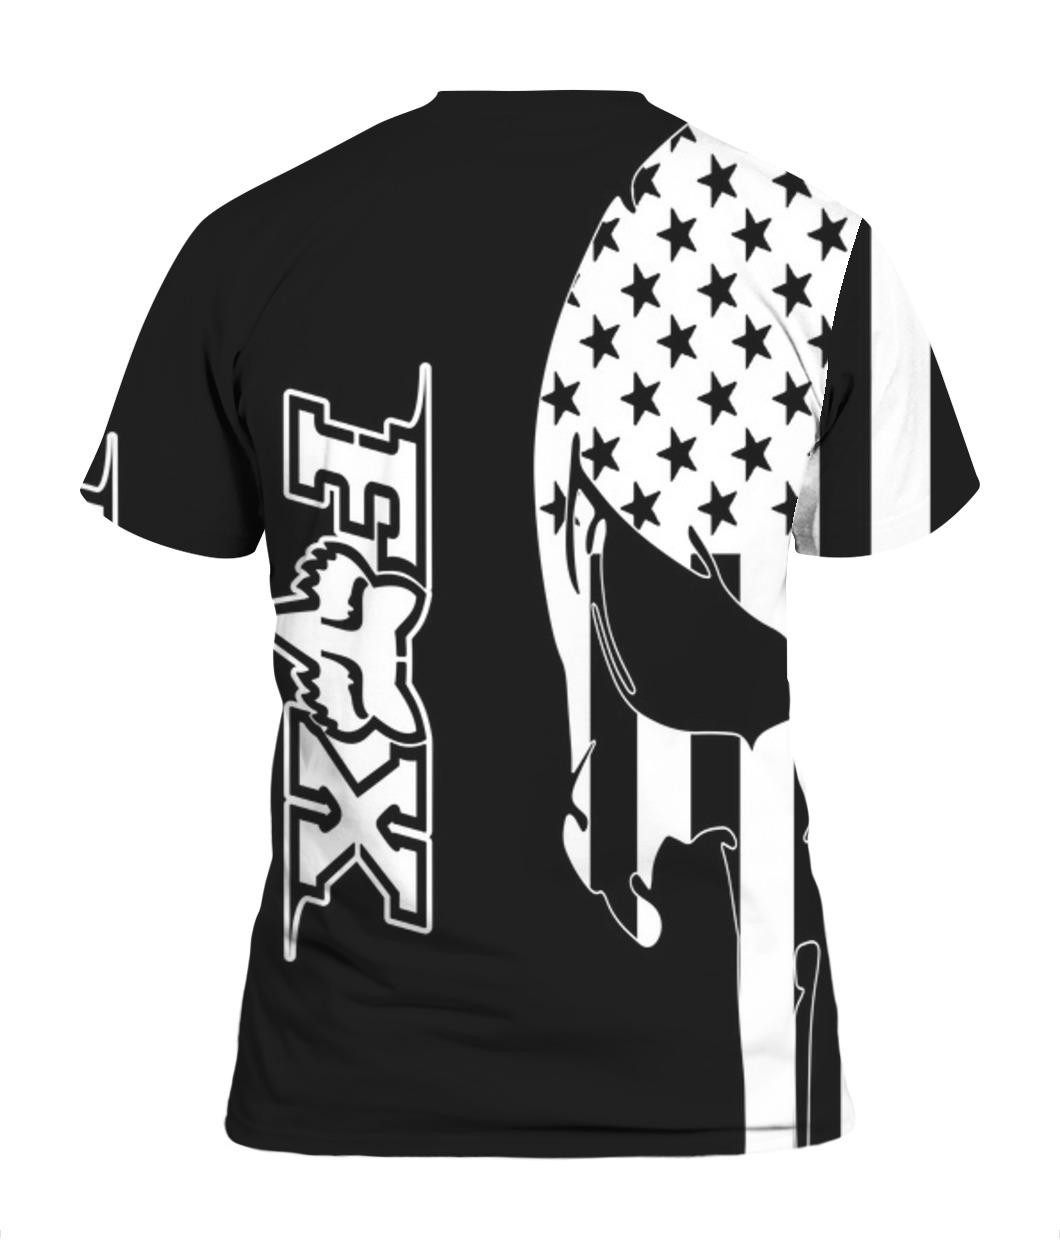 American flag skull fox racing full printing tshirt - back